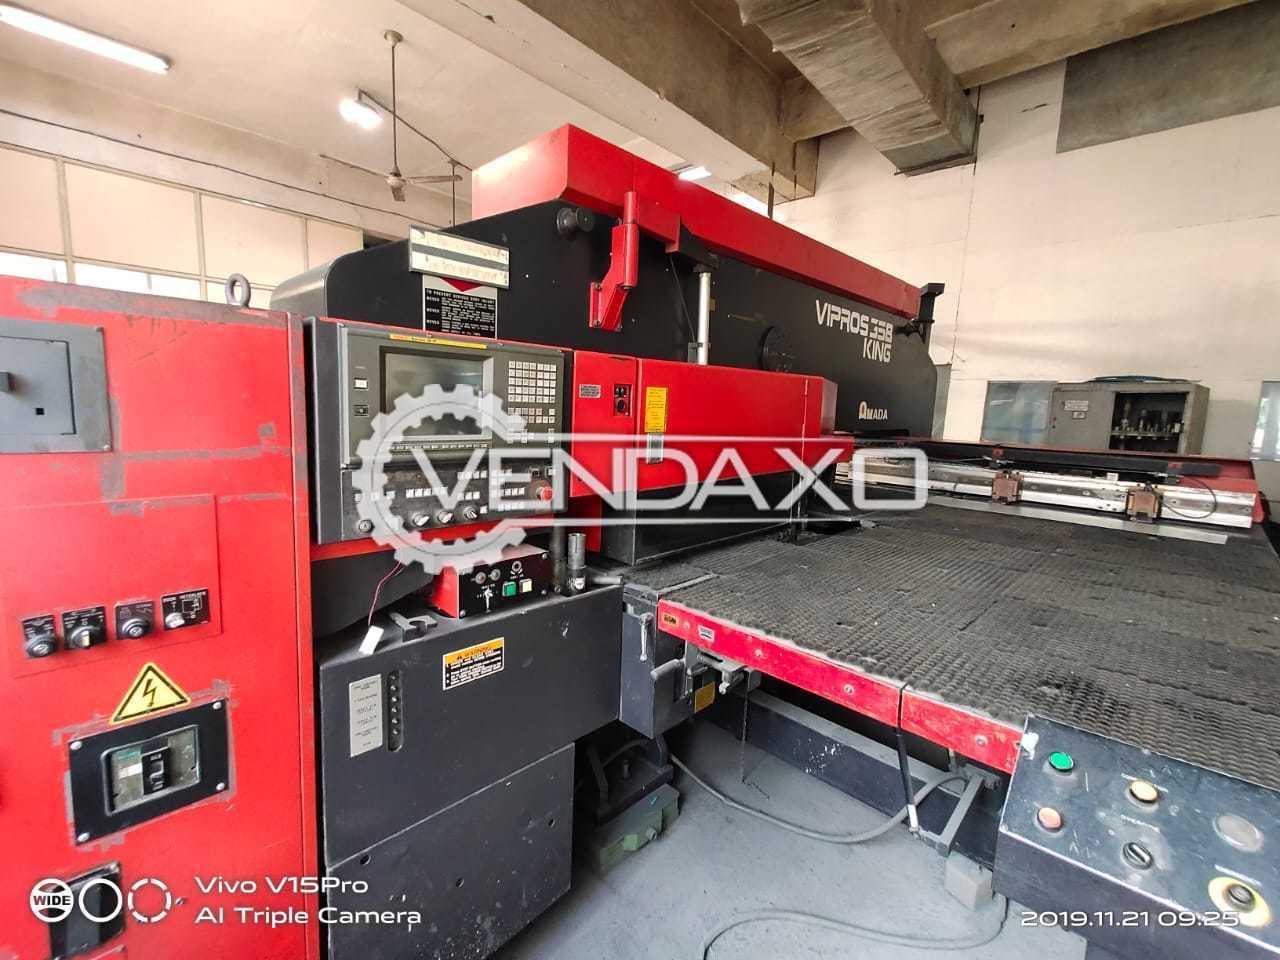 Amada Vipros 358 King CNC Turret Punching Machine - 2000 x 1270 mm